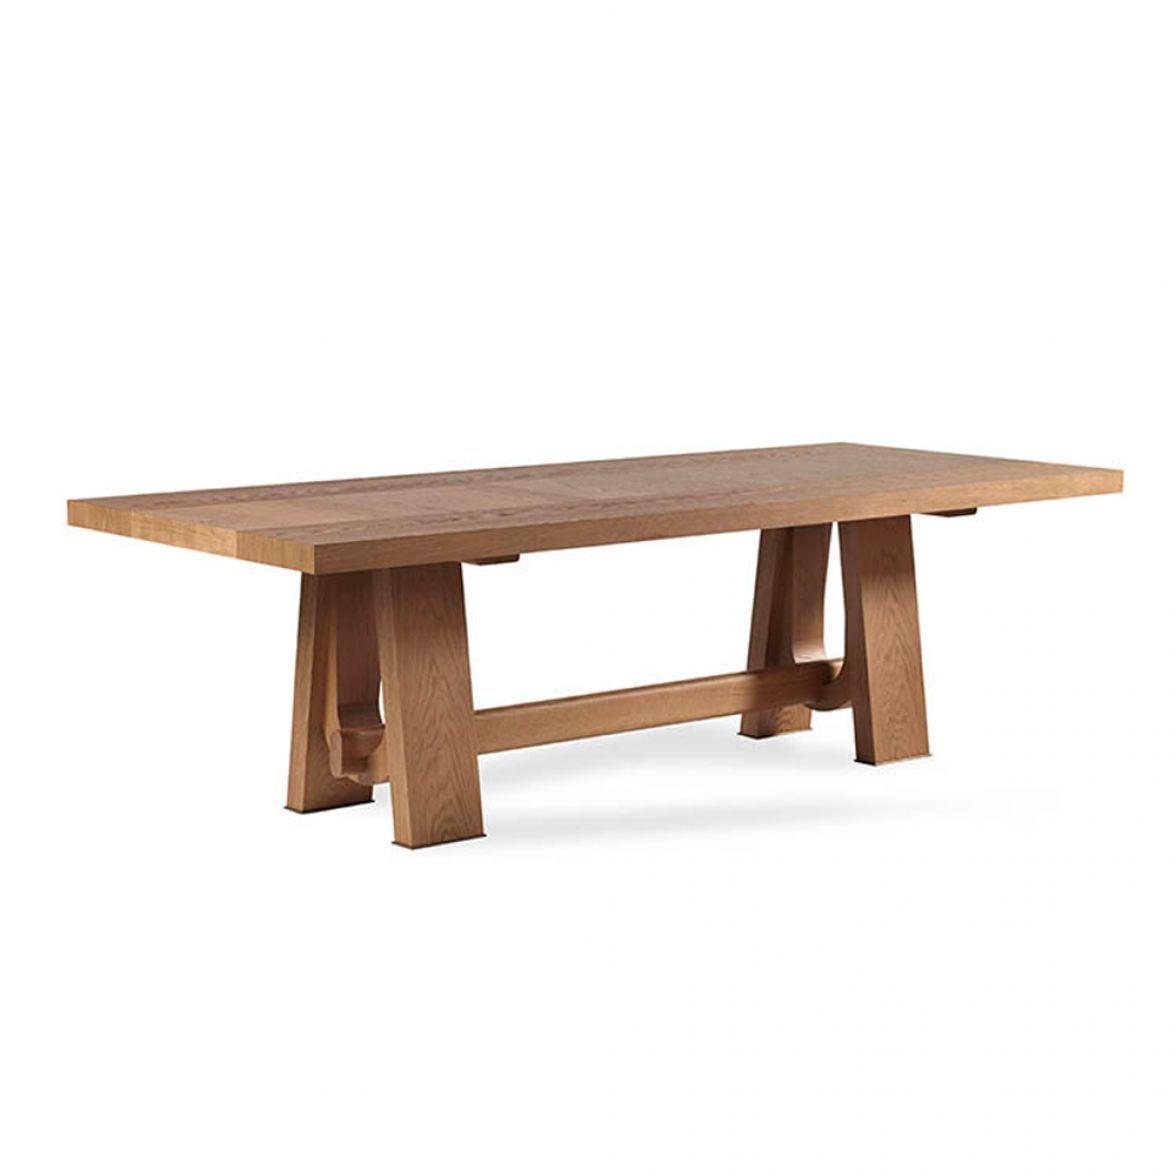 DIAPASON Dining Table